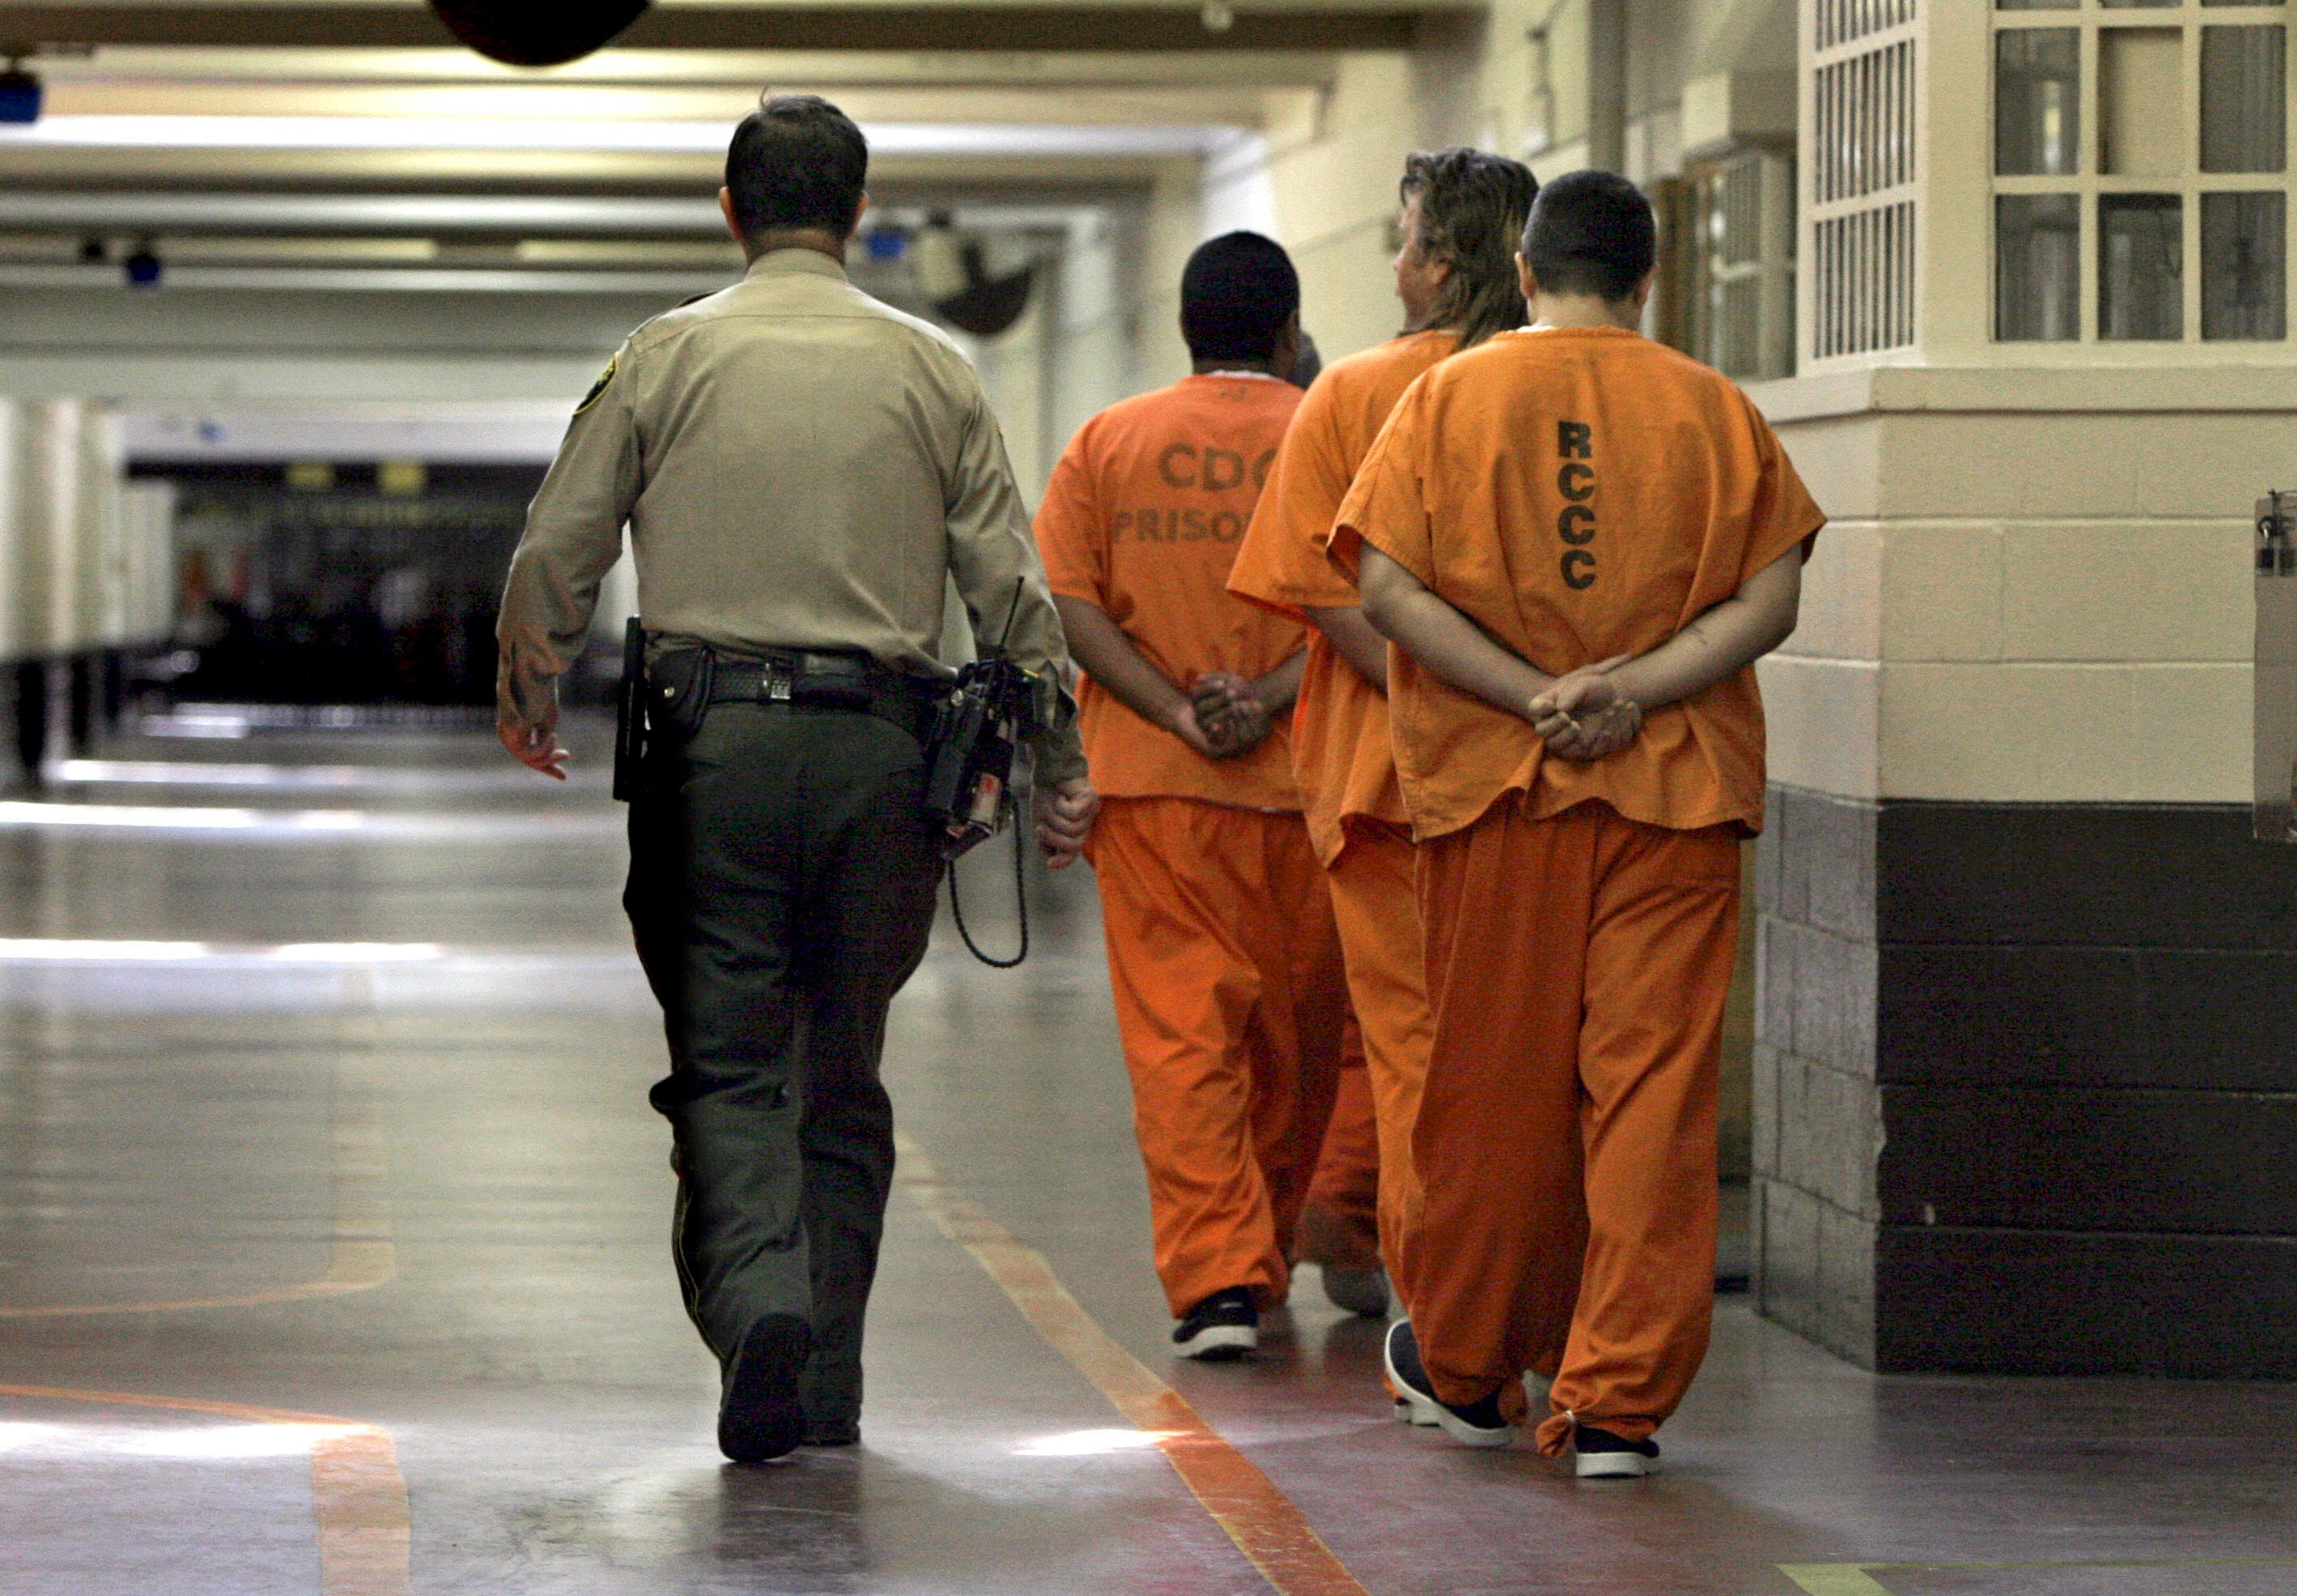 COVID-19 compels U.S. to reform prisons: Priscilla Chan, Brian Hooks